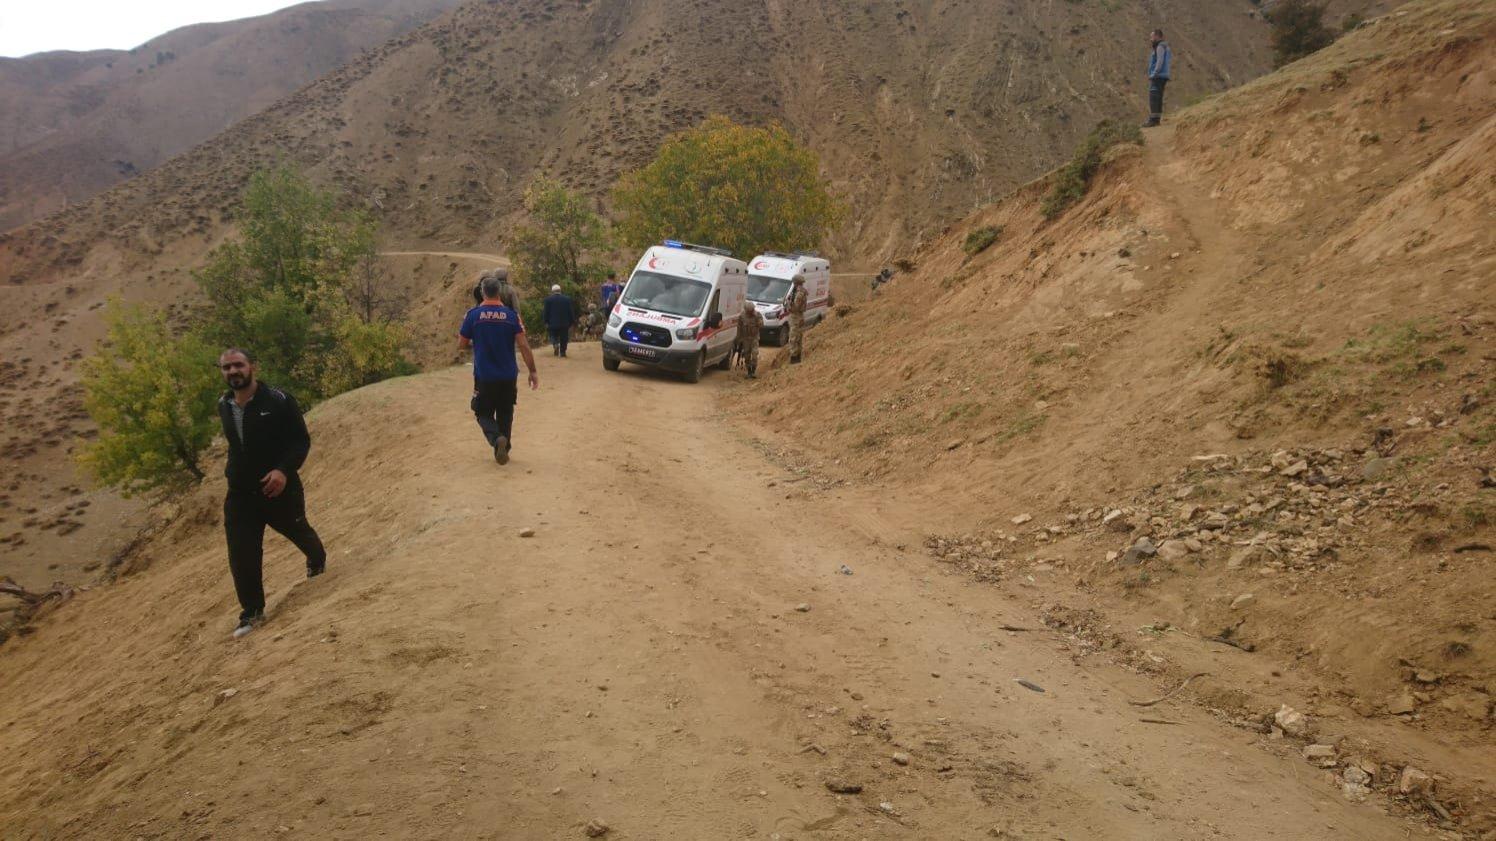 The area where the PKK terrorist attack took place in Bingöl, Turkey, Oct. 2, 2021. (DHA Photo)